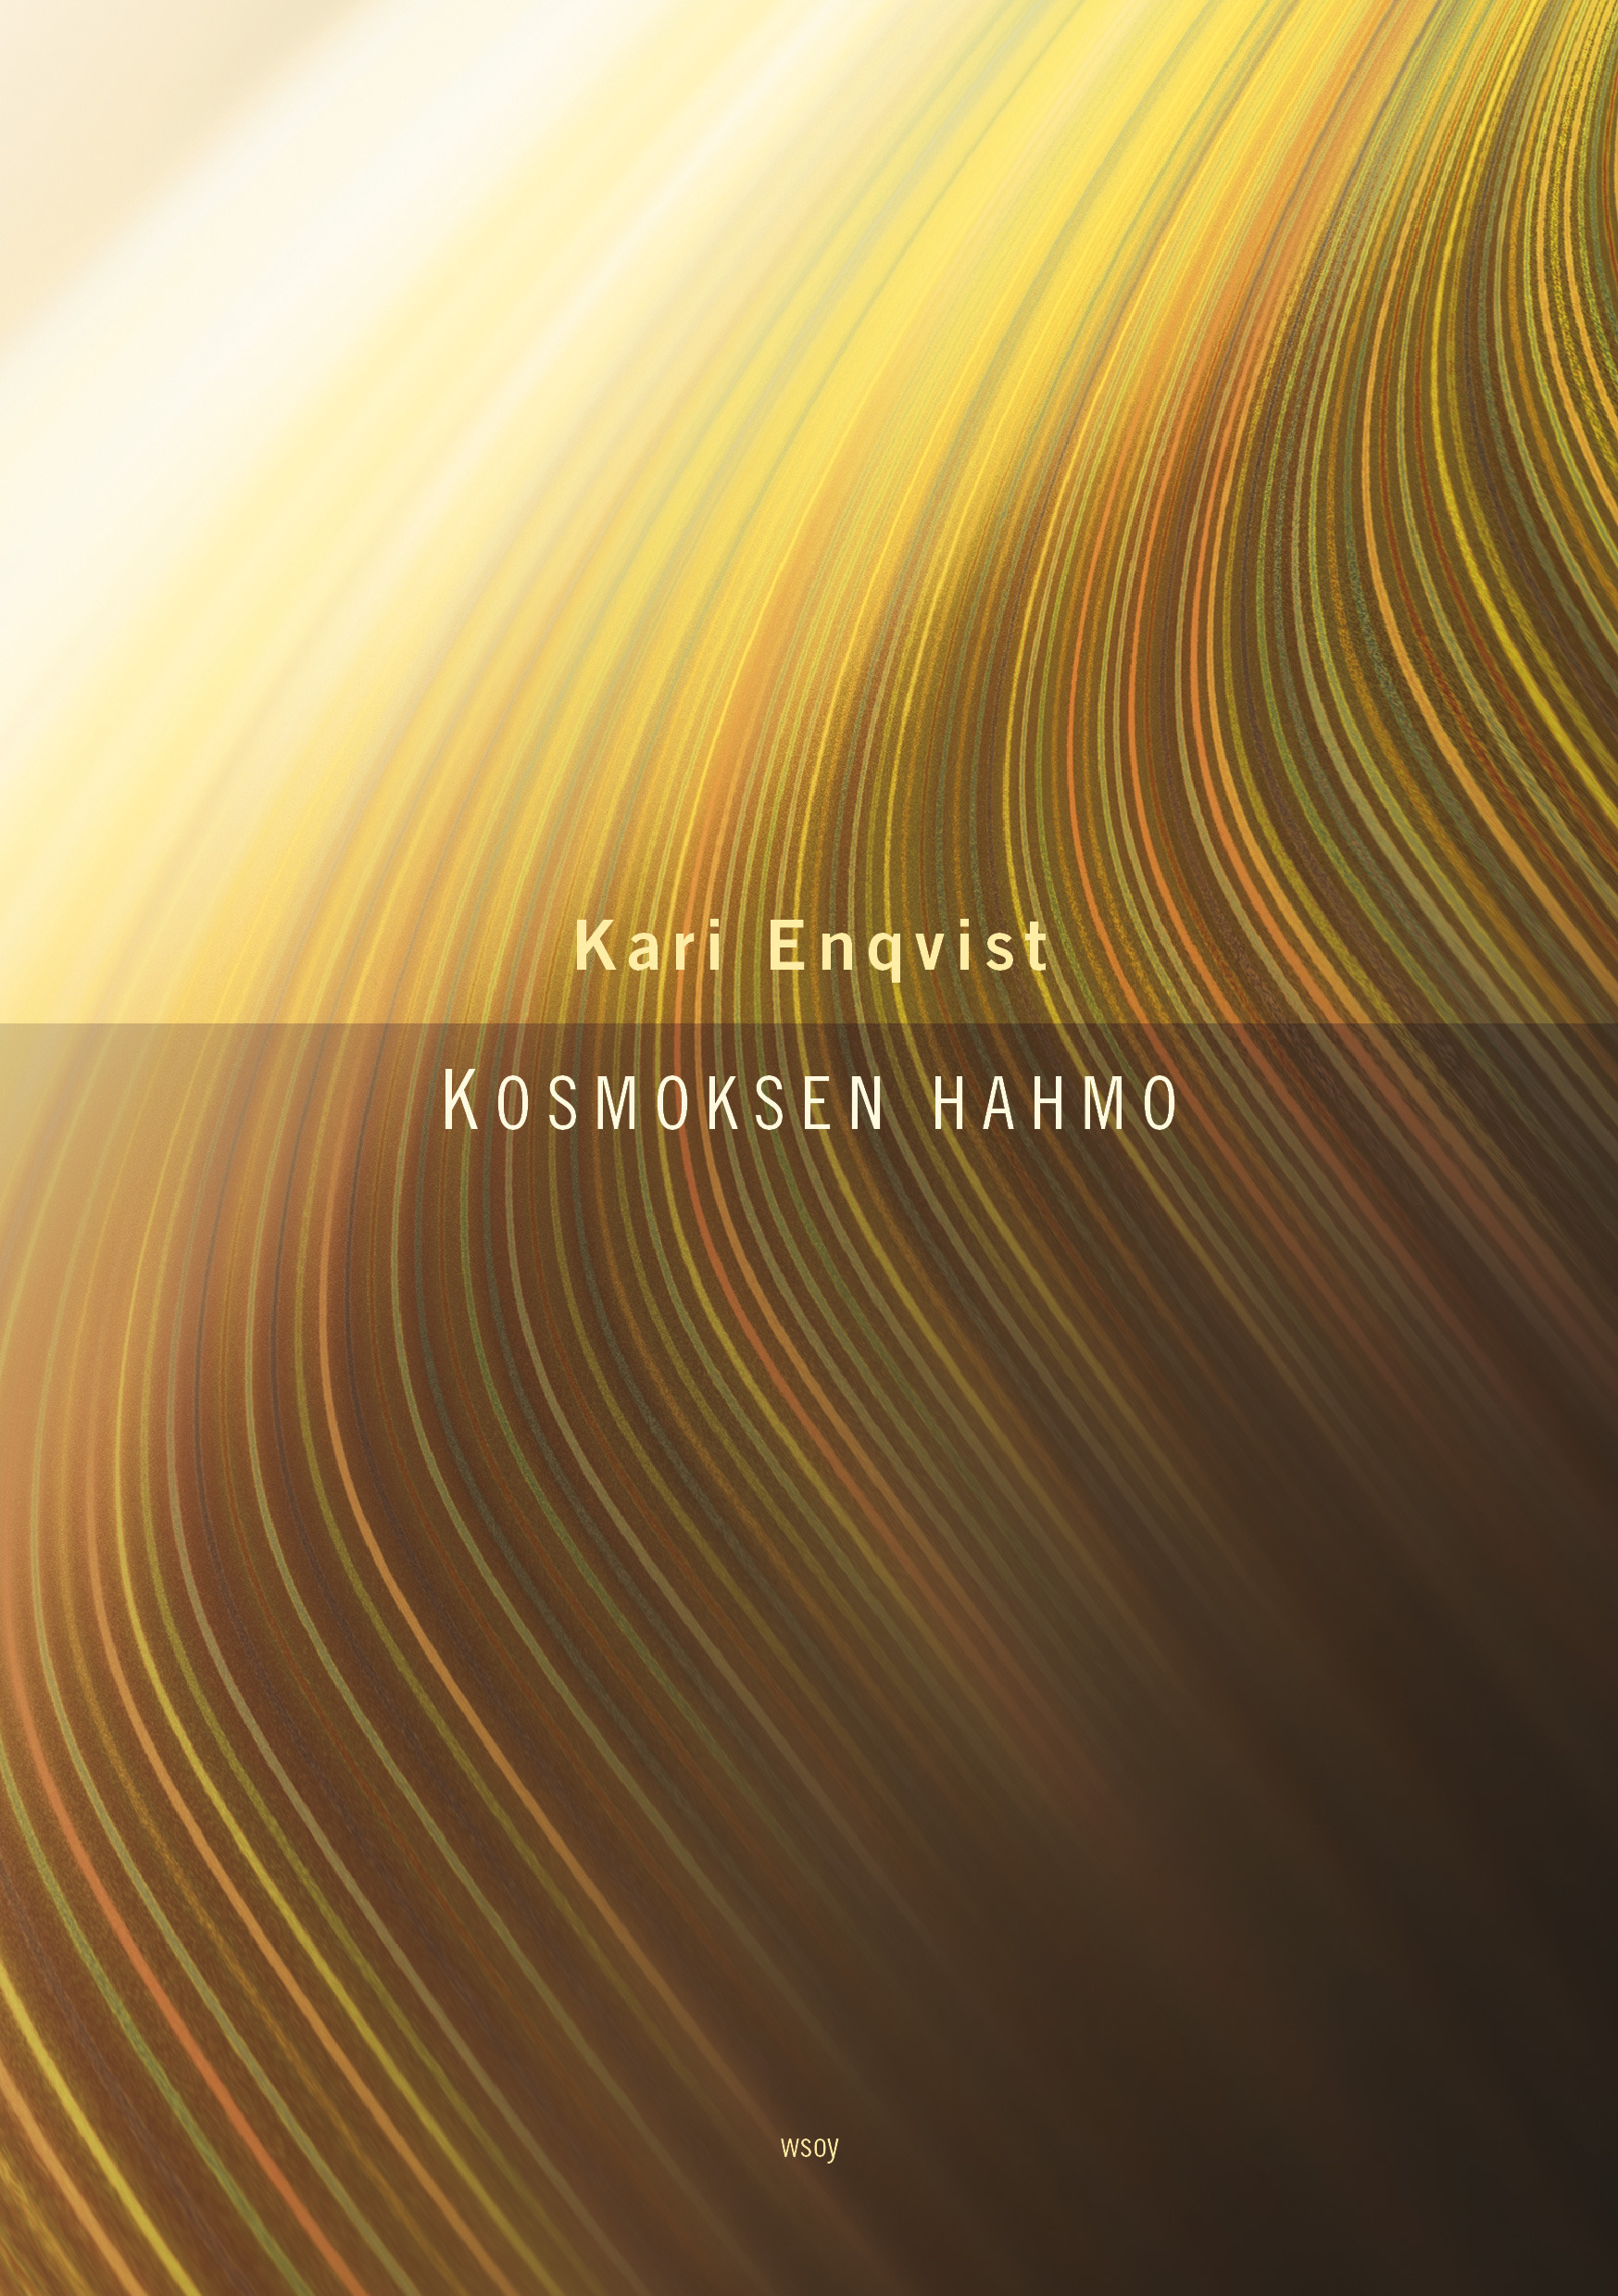 Enqvist, Kari - Kosmoksen hahmo, e-kirja